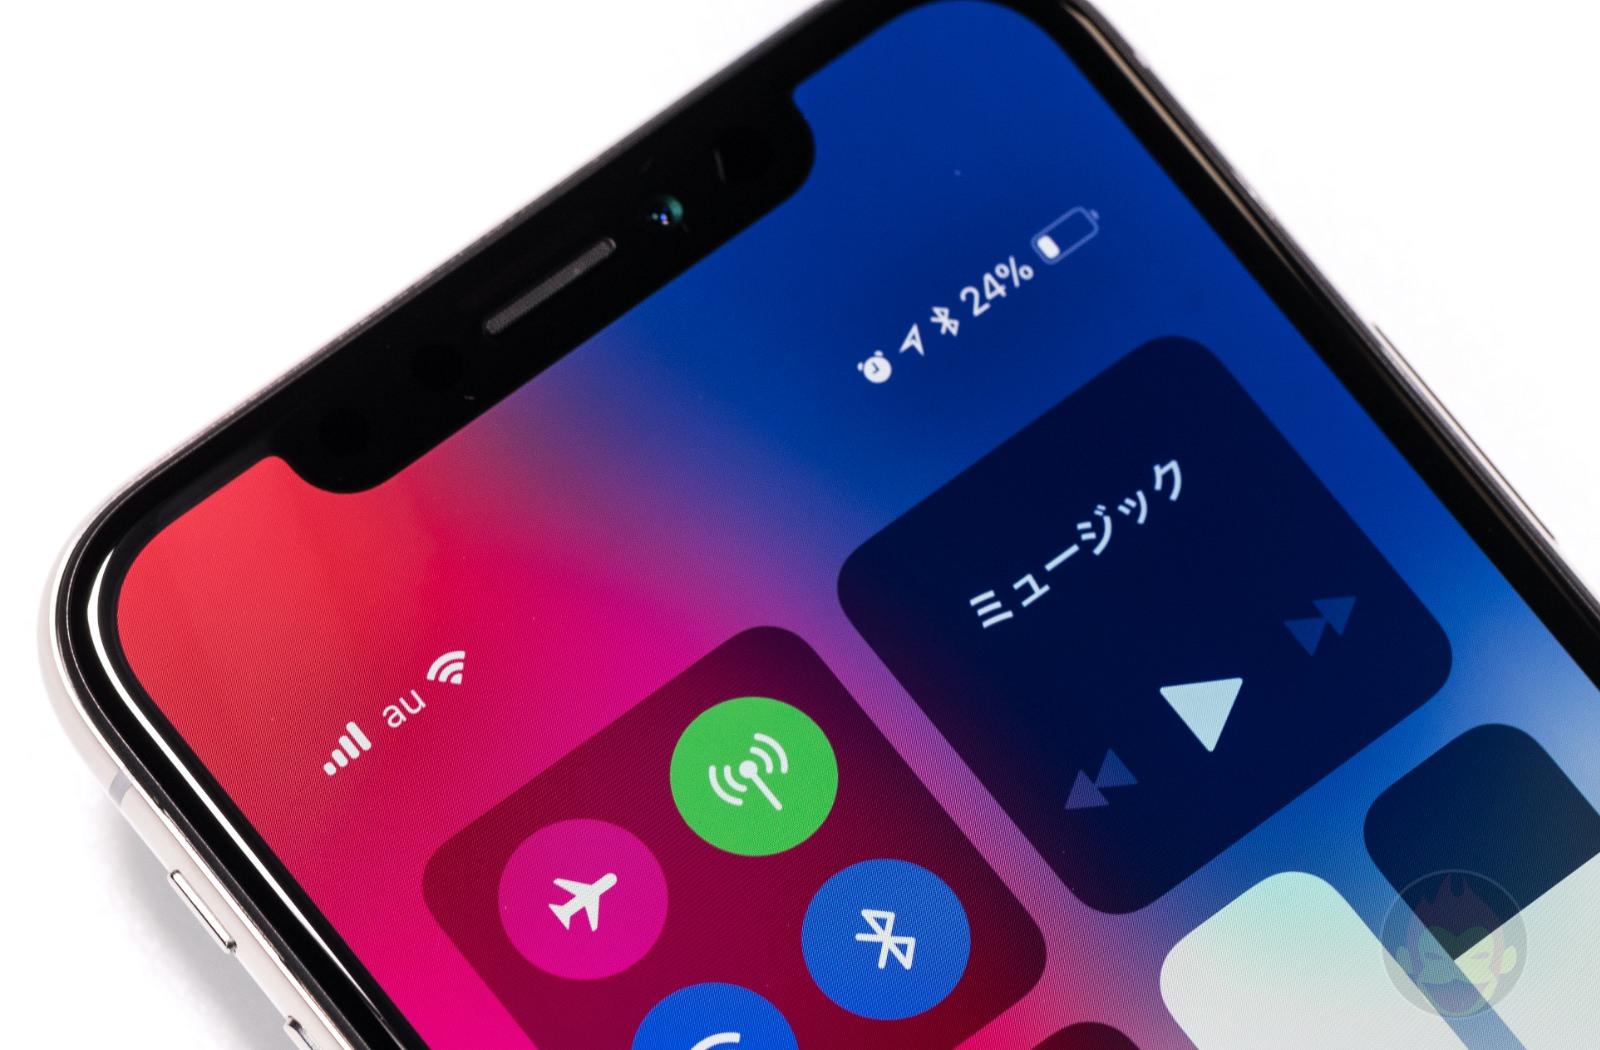 iphonex-truedepth-camera-the-notch.jpg